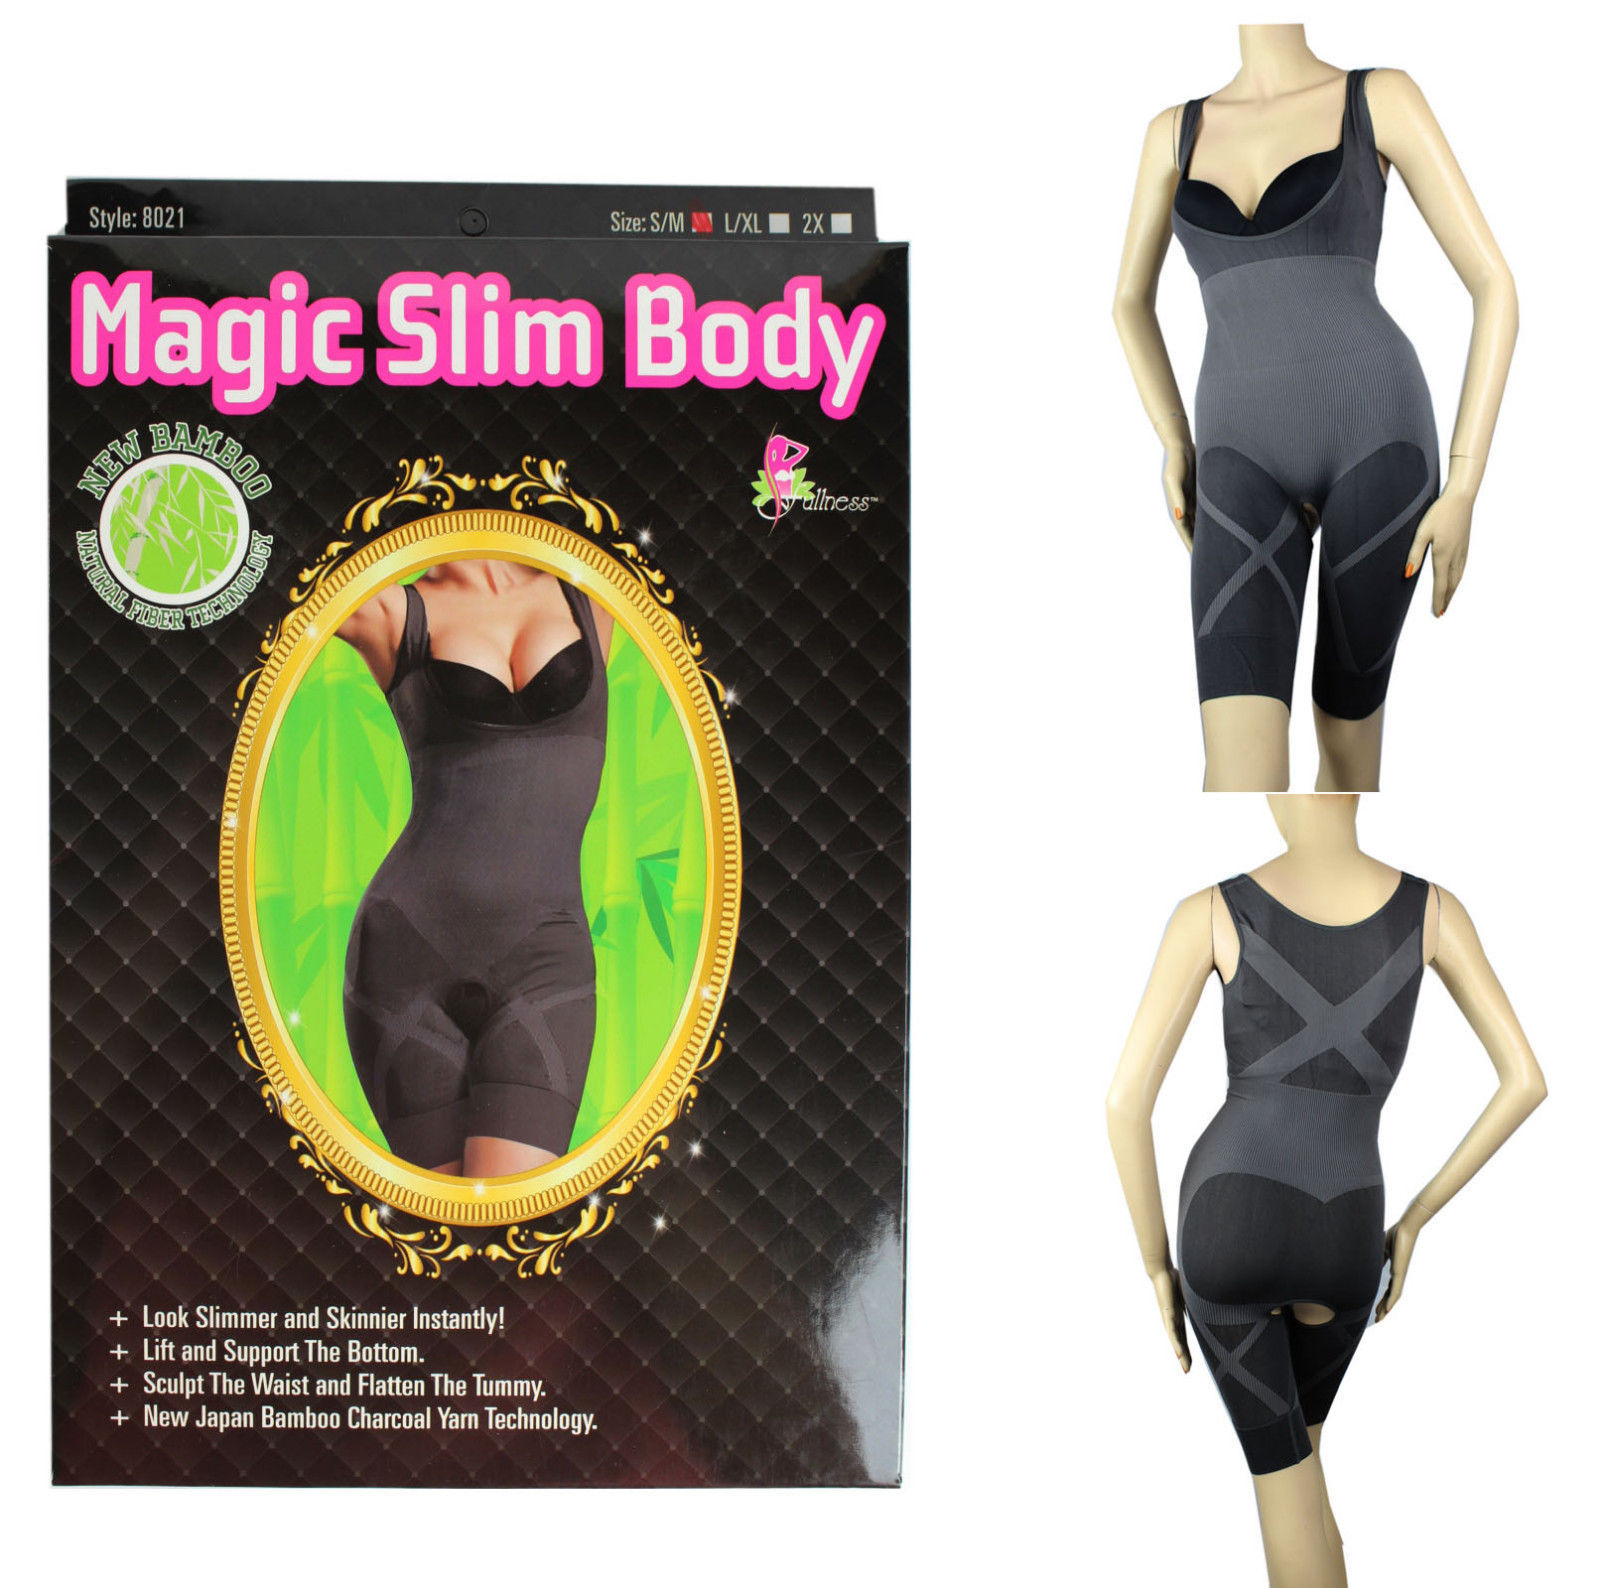 1cc7b37e2f16b Sexy MAGIC SLIM BODY Natural Bamboo Butt Lift Scult Waist Invisible Tummy  SHAPE -  17.99